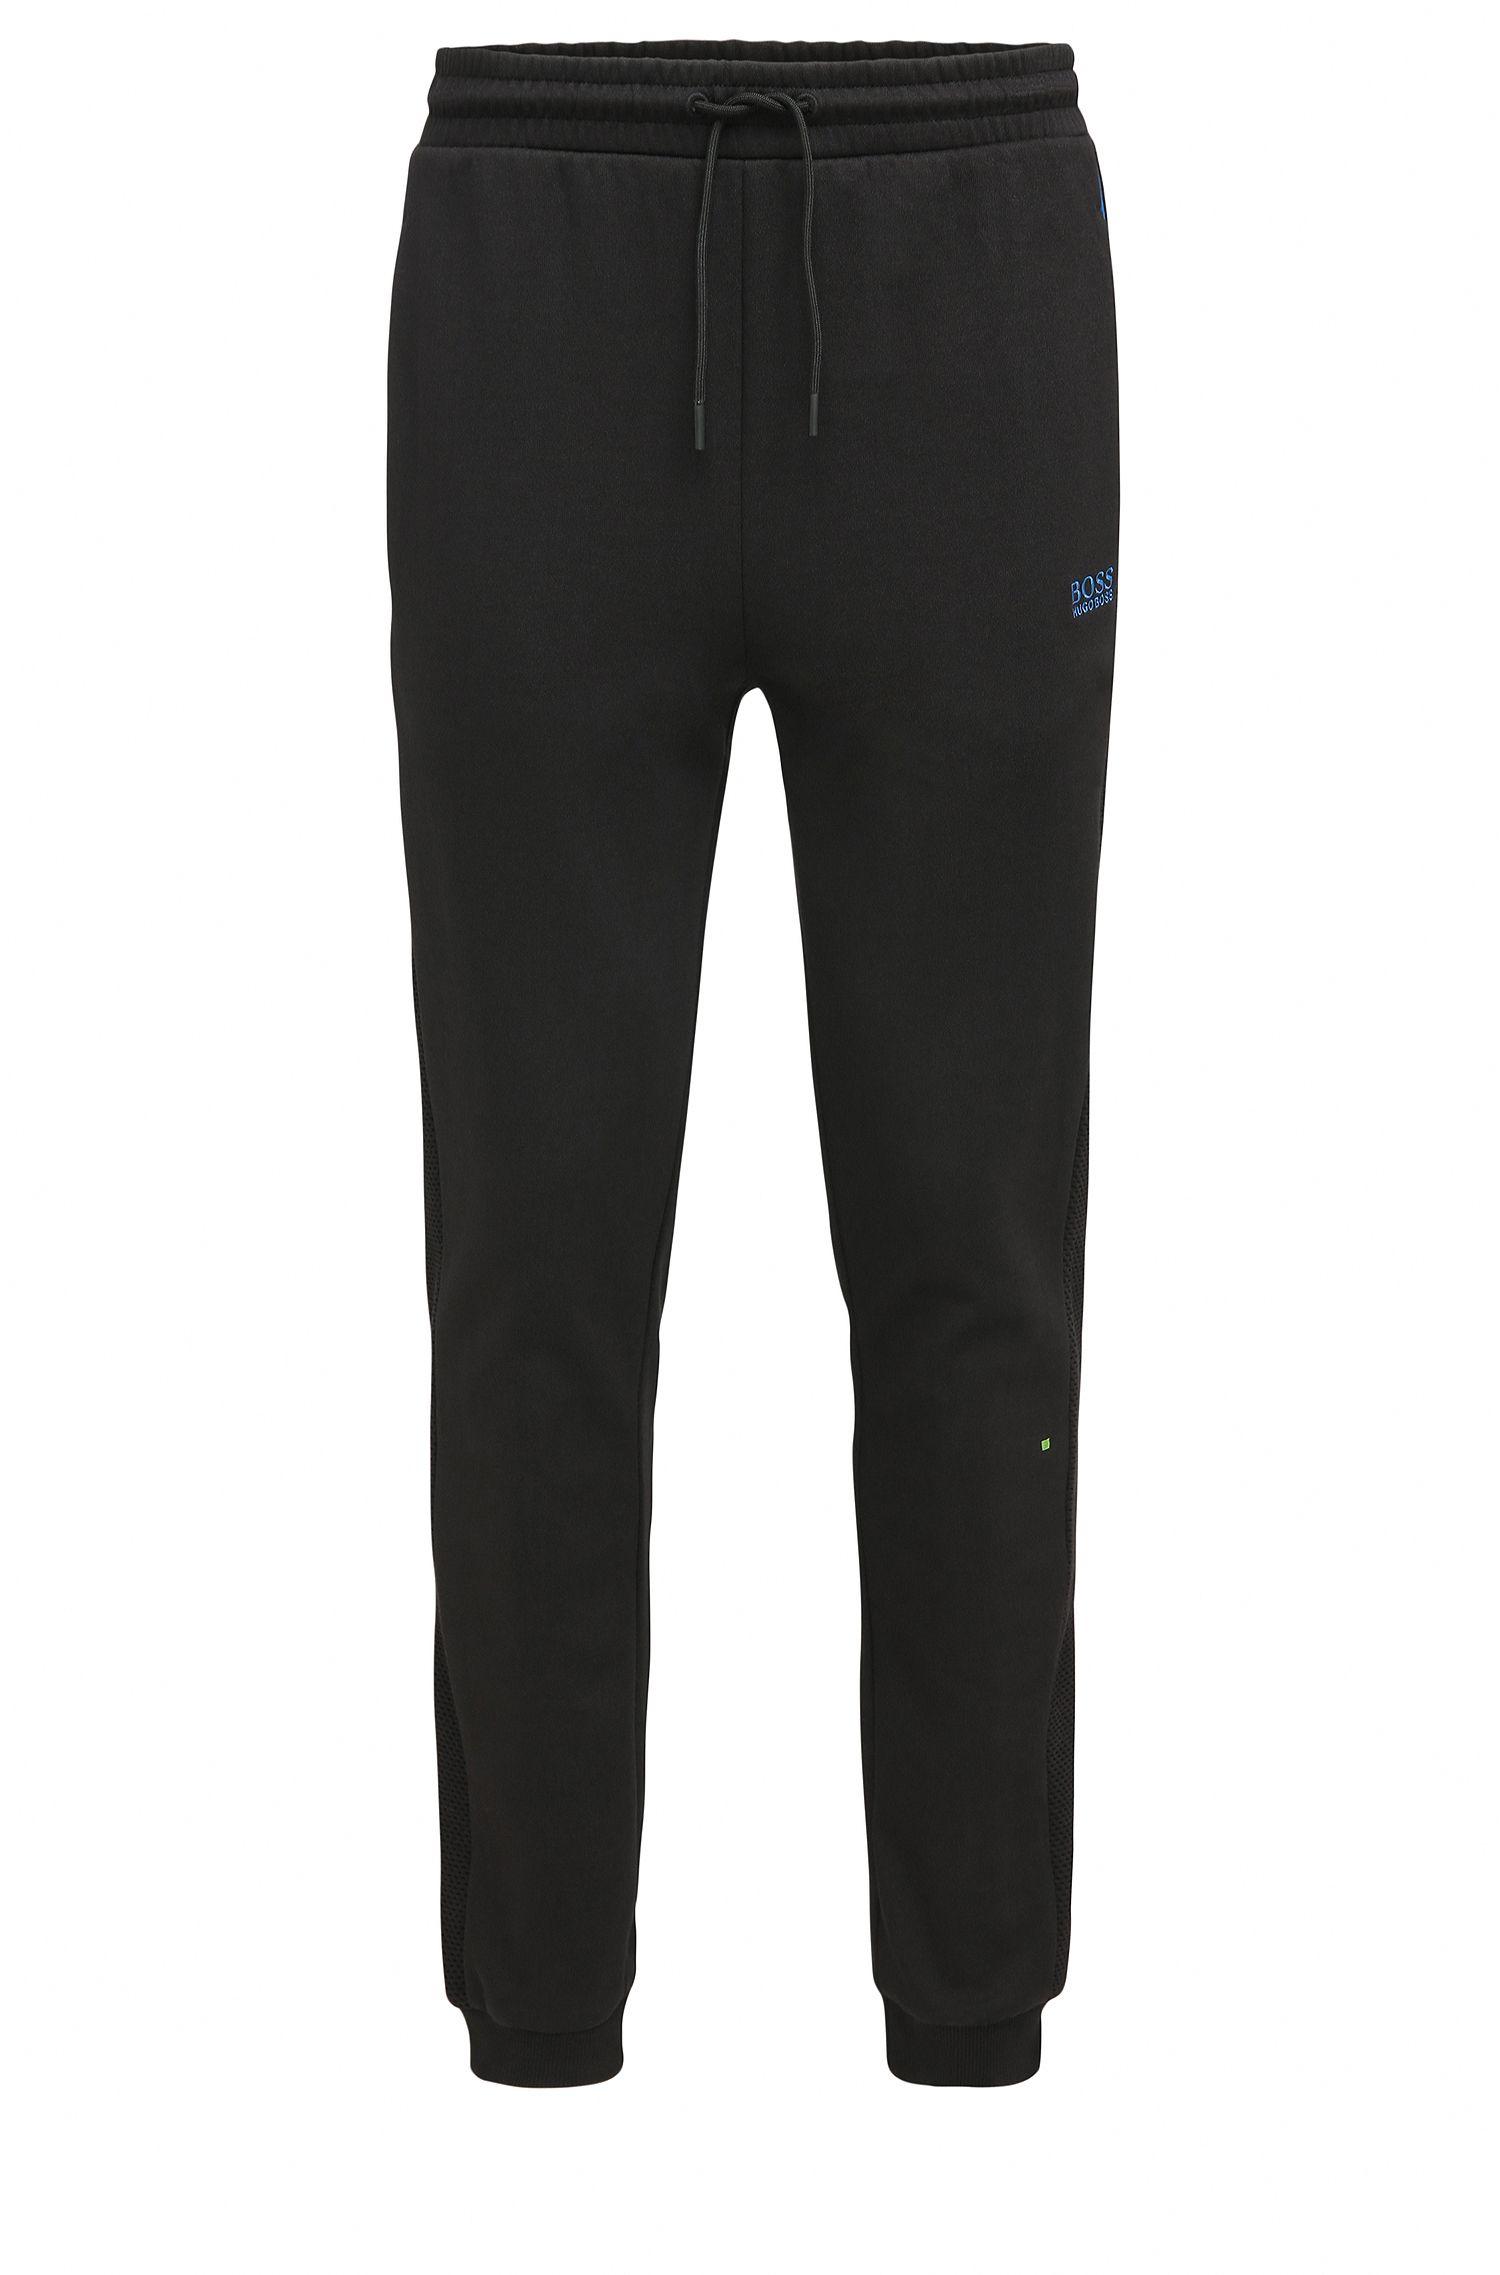 Stretch Cotton Pant | Hivon, Black